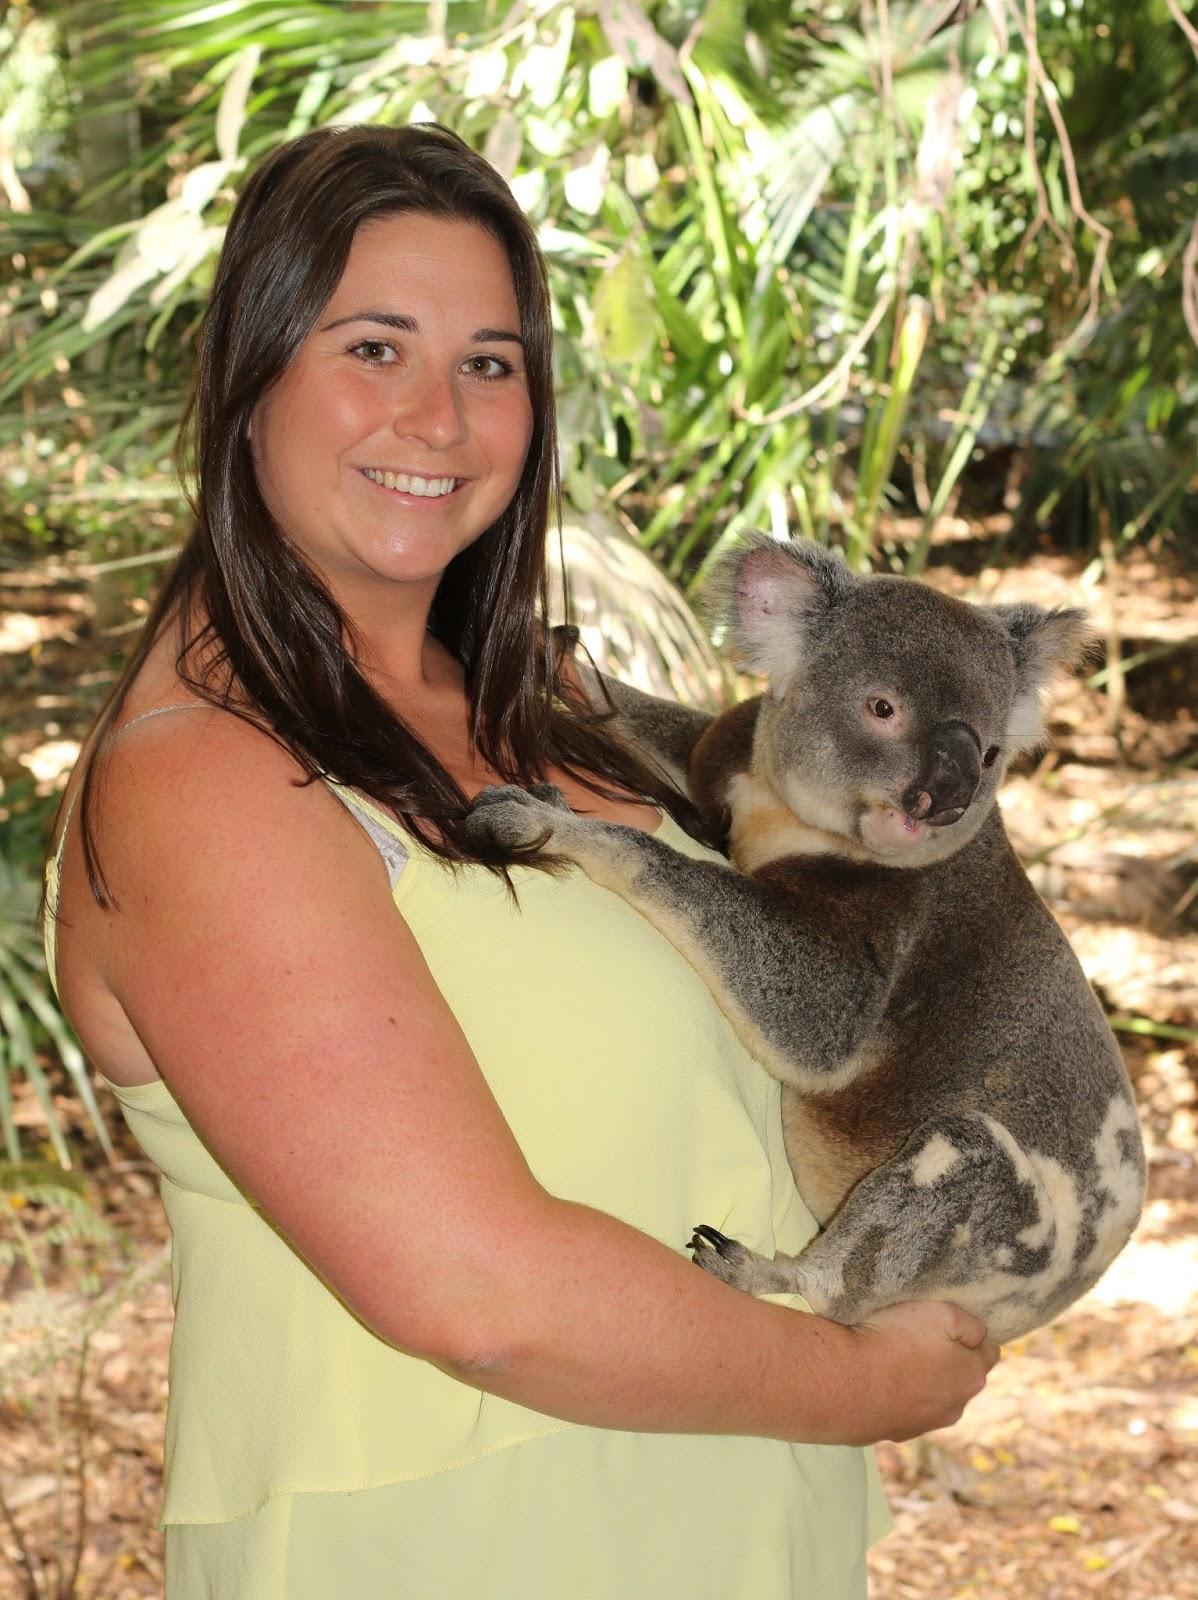 The Aussie Flashpacker cuddling a koala at Lone Pine Koala Sanctuary